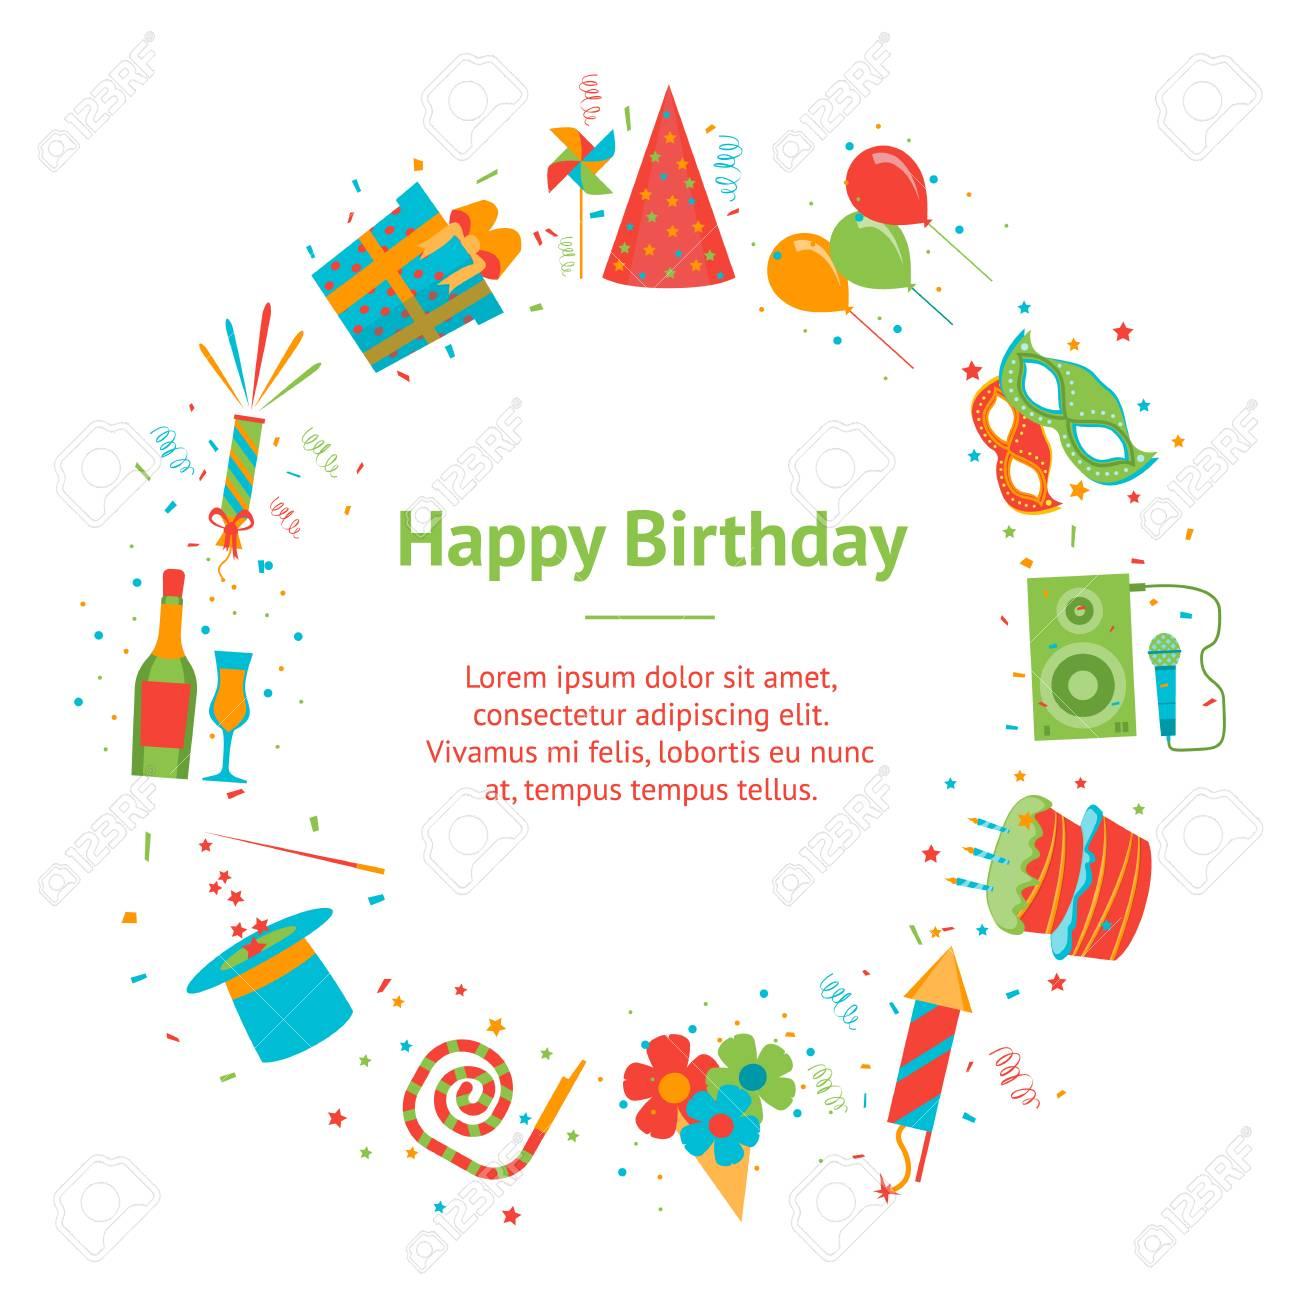 Happy Birthday greeting card design, vector illustration